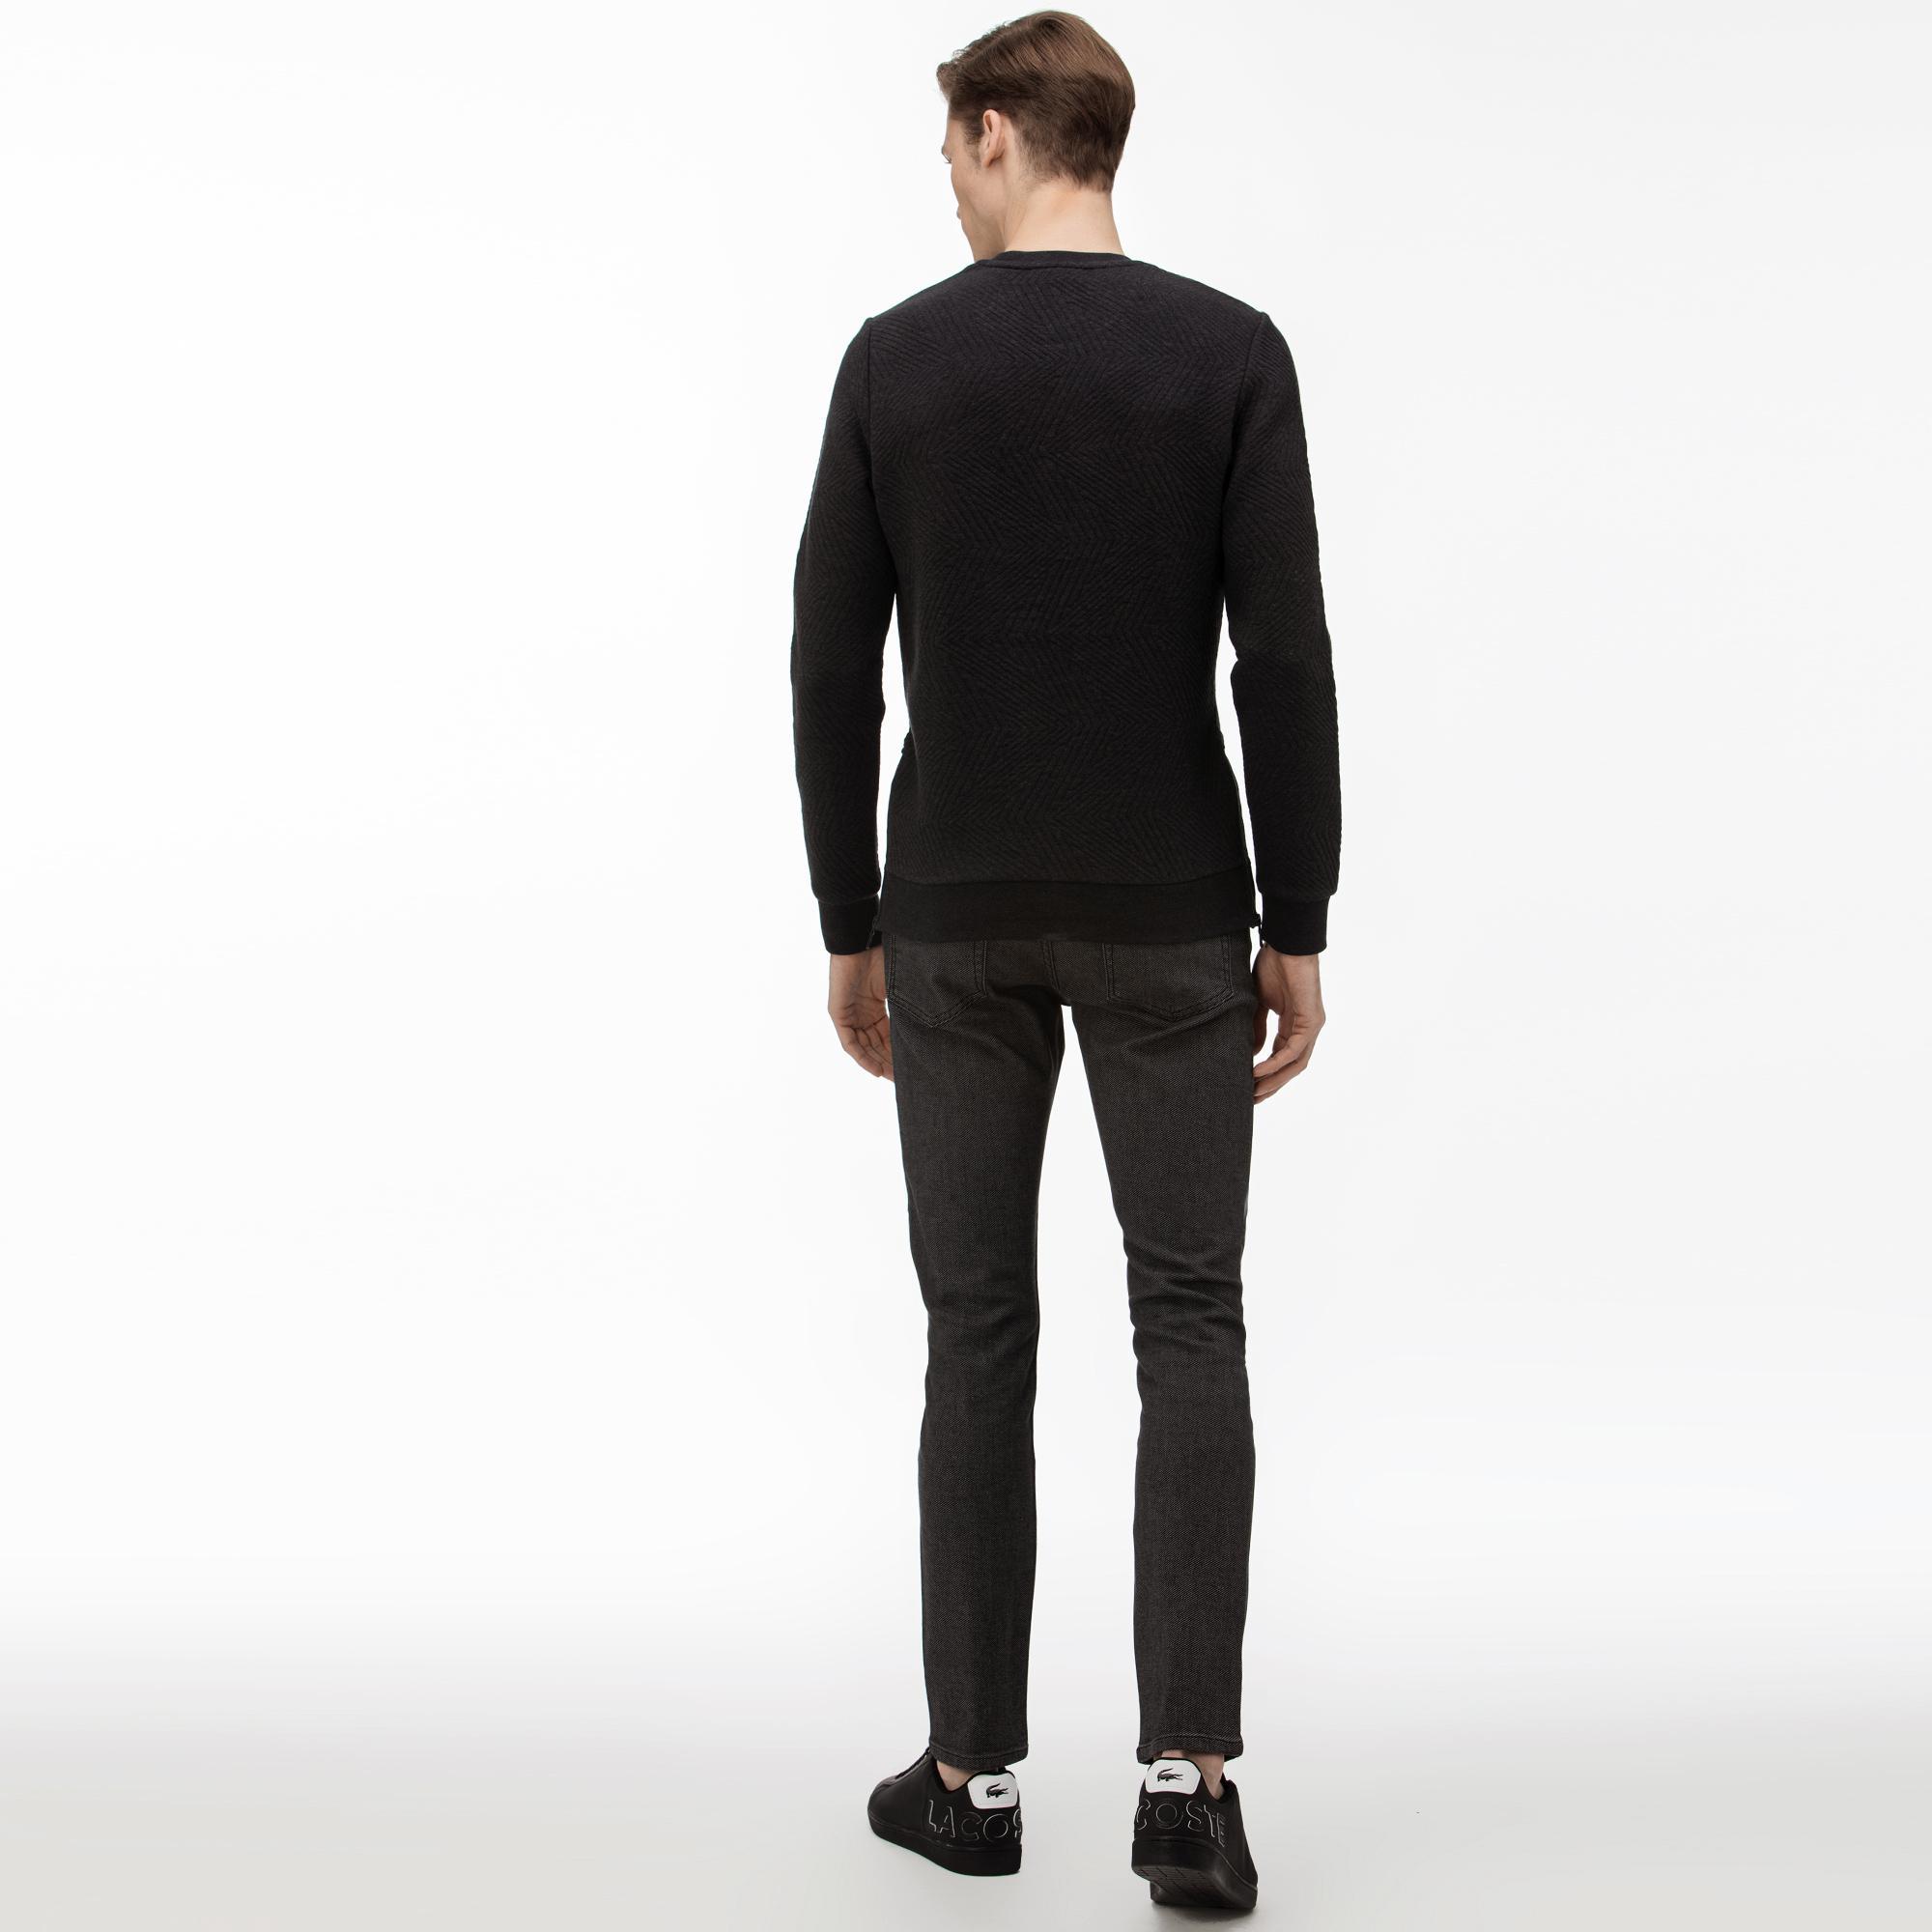 Lacoste Spodnie Męskie Slim Fit